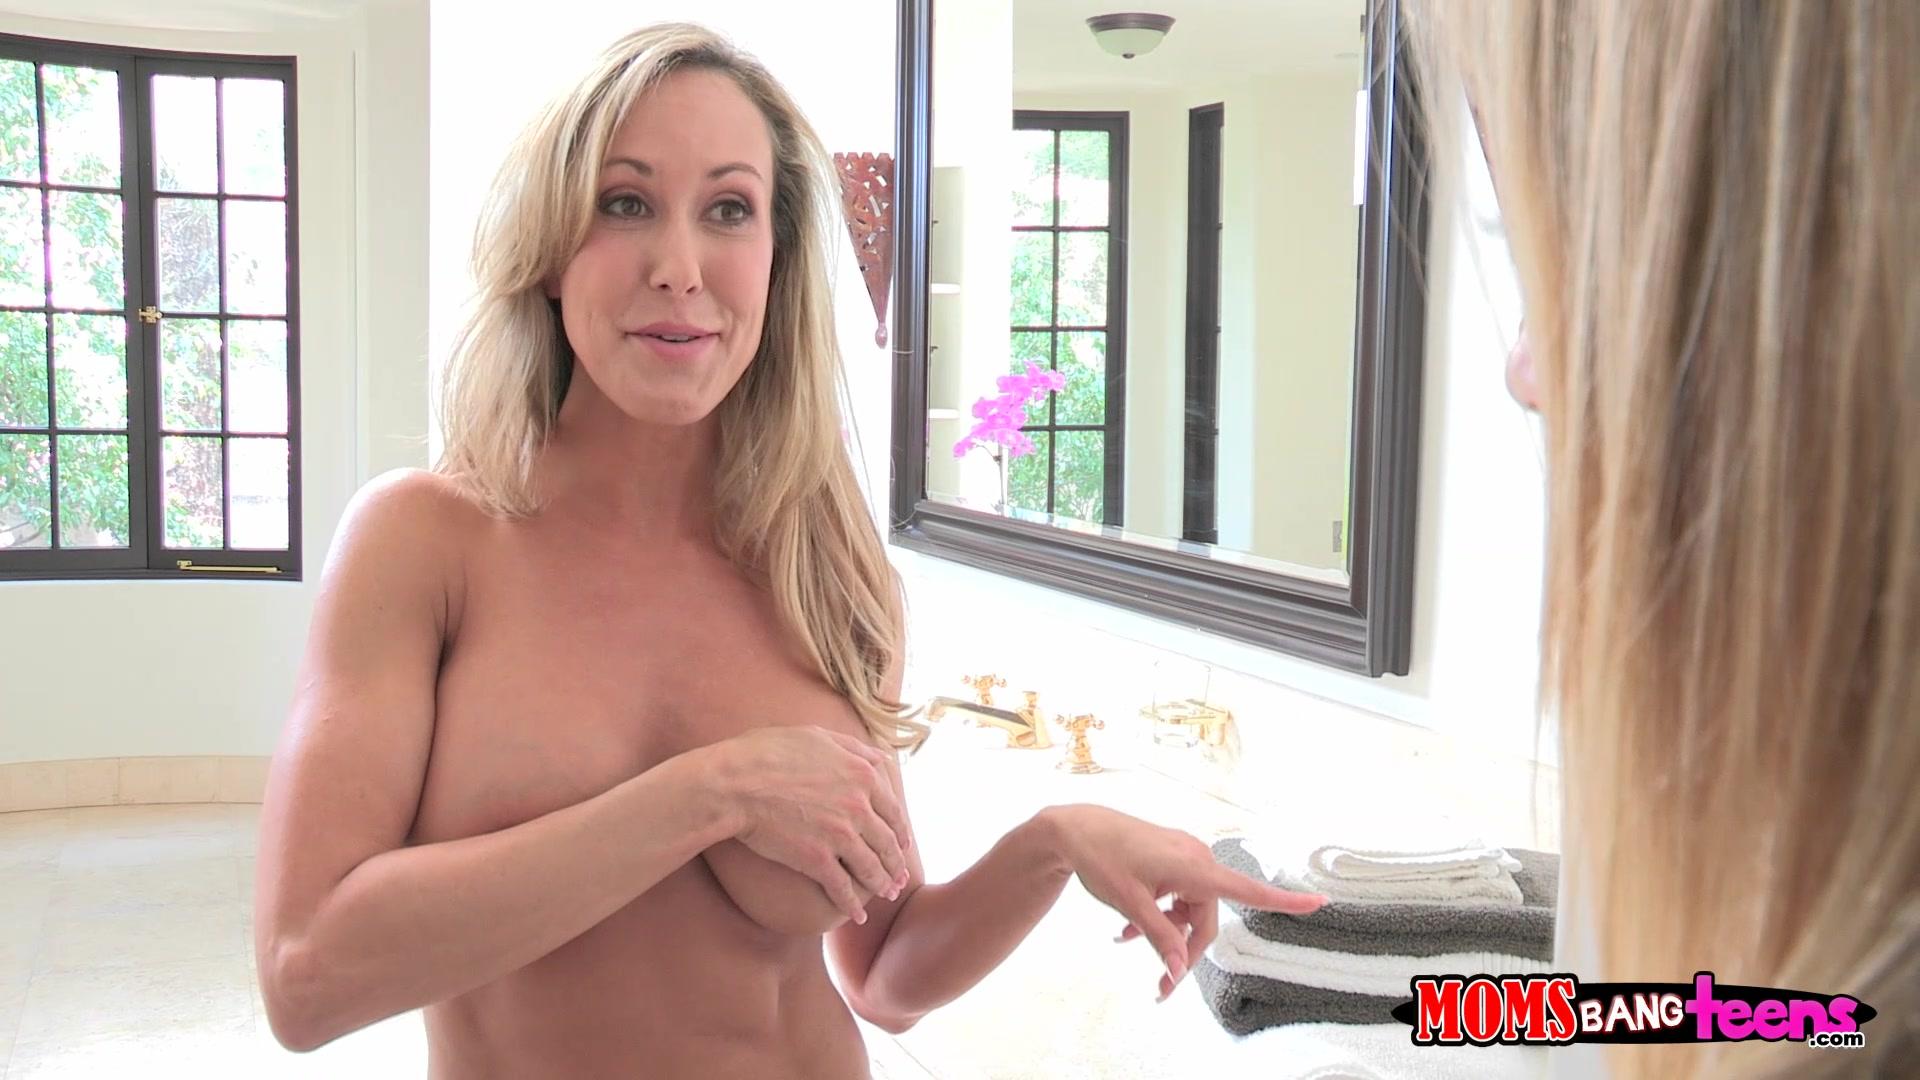 Hot sexy nude girls in the sun